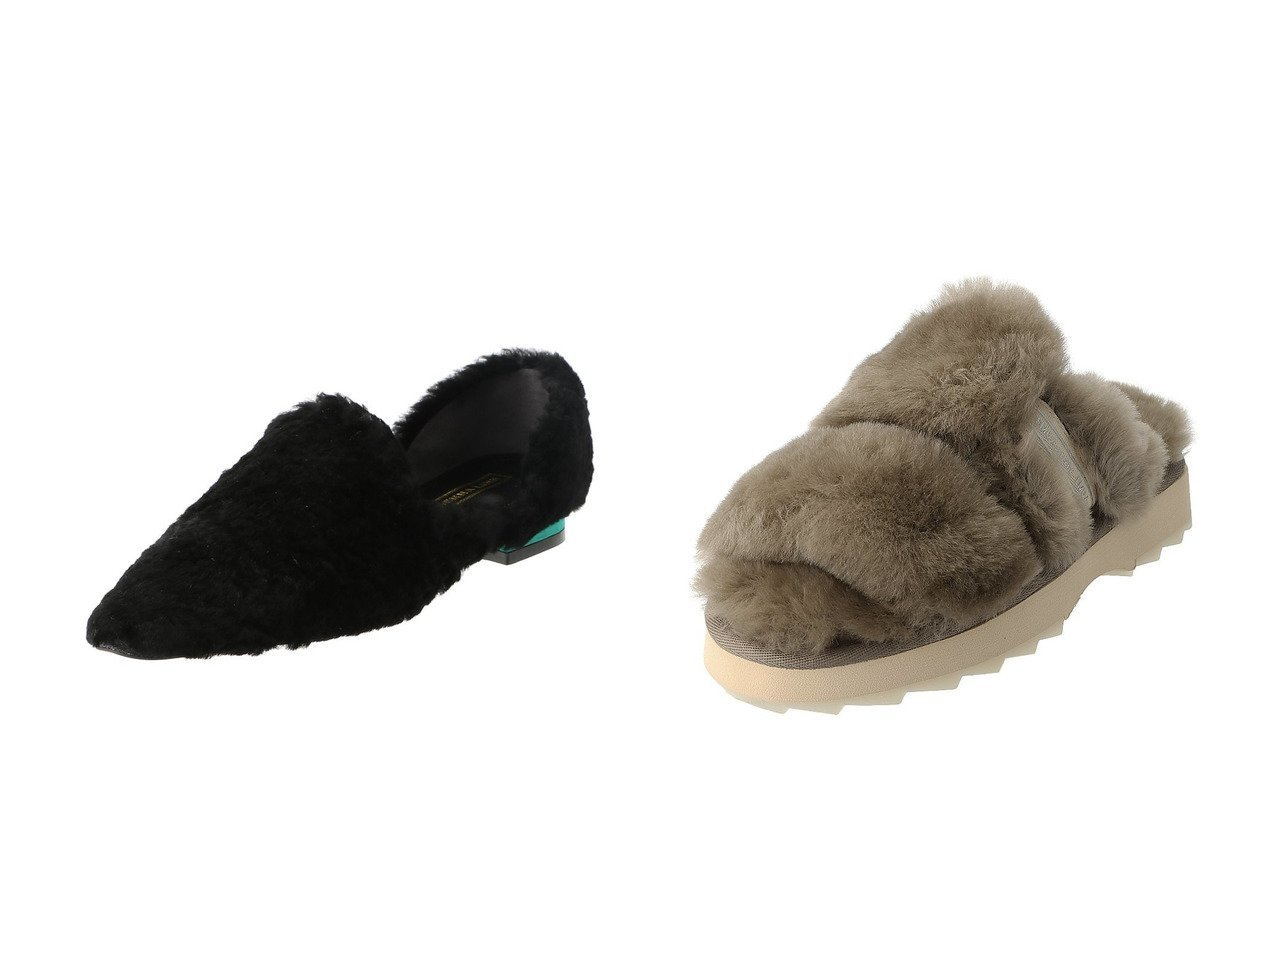 【Daniella & GEMMA/ダニエラ アンド ジェマ】の【AKIKO KIZU × Daniella & GEMMA】ムートンセパレートフラットシューズ&【EMU Australia/エミュ オーストラリア】のWobbegong 厚底シープスキンサンダル シューズ・靴のおすすめ!人気、レディースファッションの通販  おすすめで人気のファッション通販商品 インテリア・家具・キッズファッション・メンズファッション・レディースファッション・服の通販 founy(ファニー) https://founy.com/ ファッション Fashion レディース WOMEN サンダル シンプル 厚底 インソール クッション クール サテン シューズ バランス フラット |ID:crp329100000000100